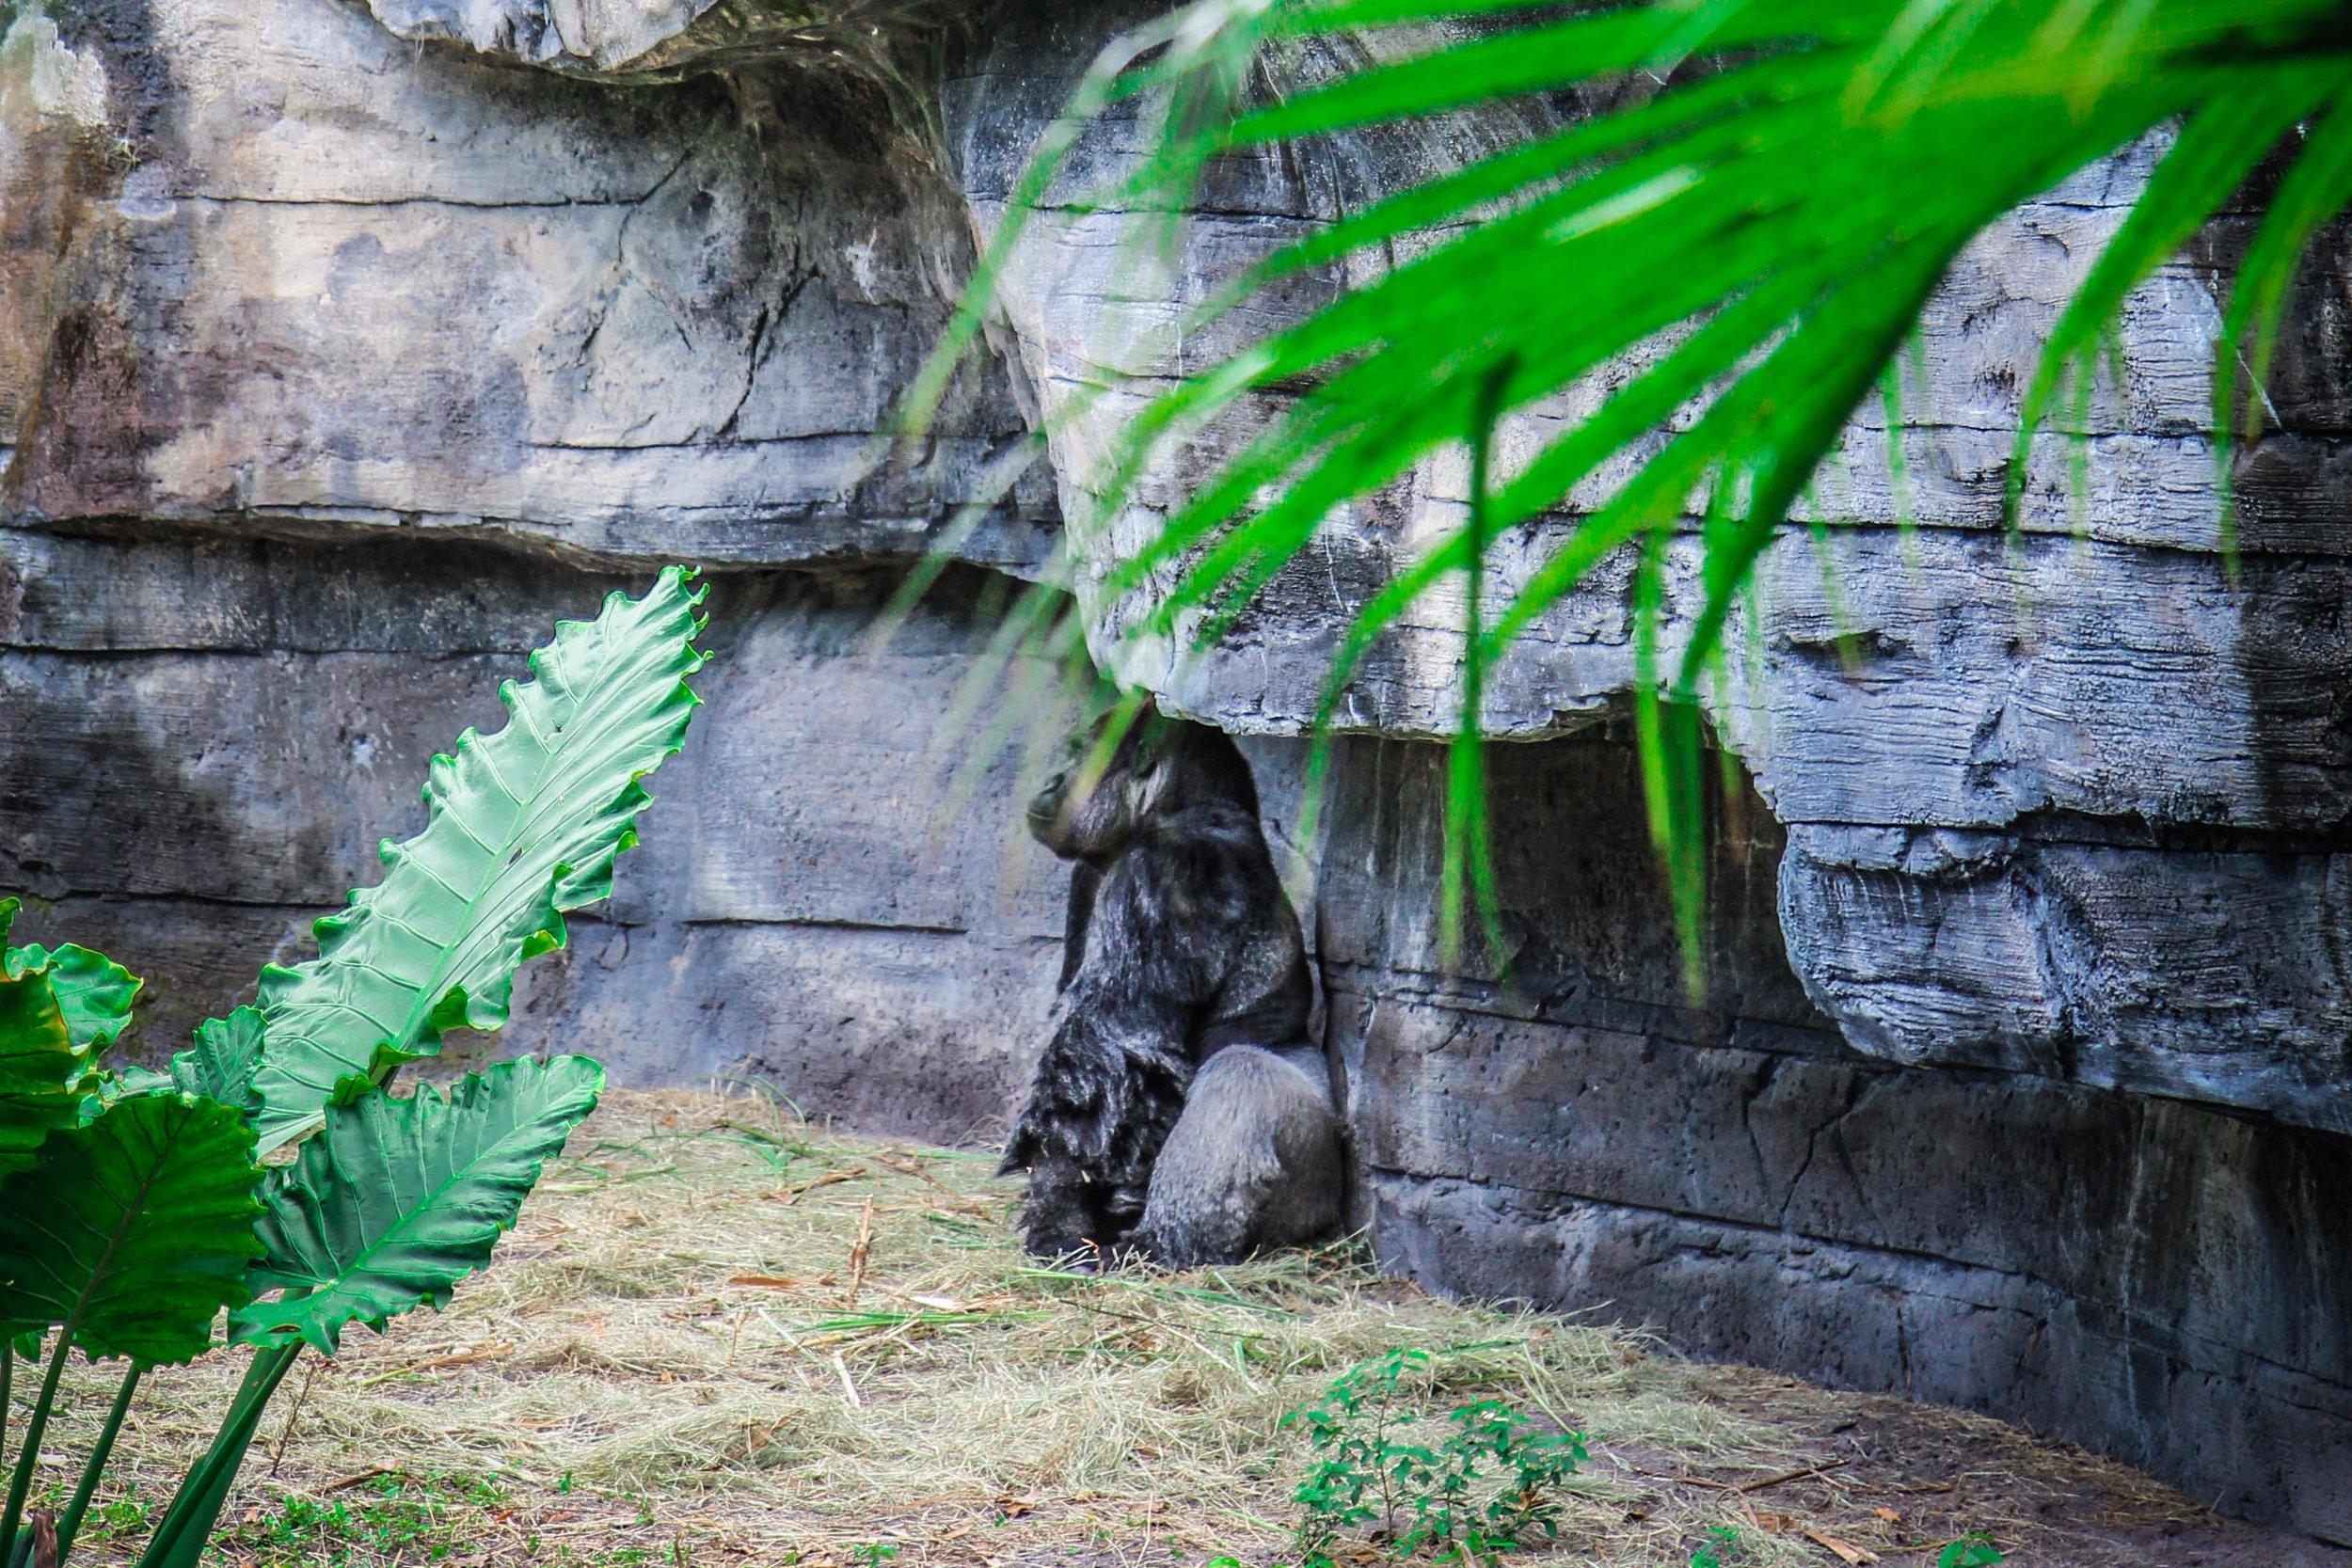 Animal_kingdom_orlando_reizen_met_kinderen-42.jpg